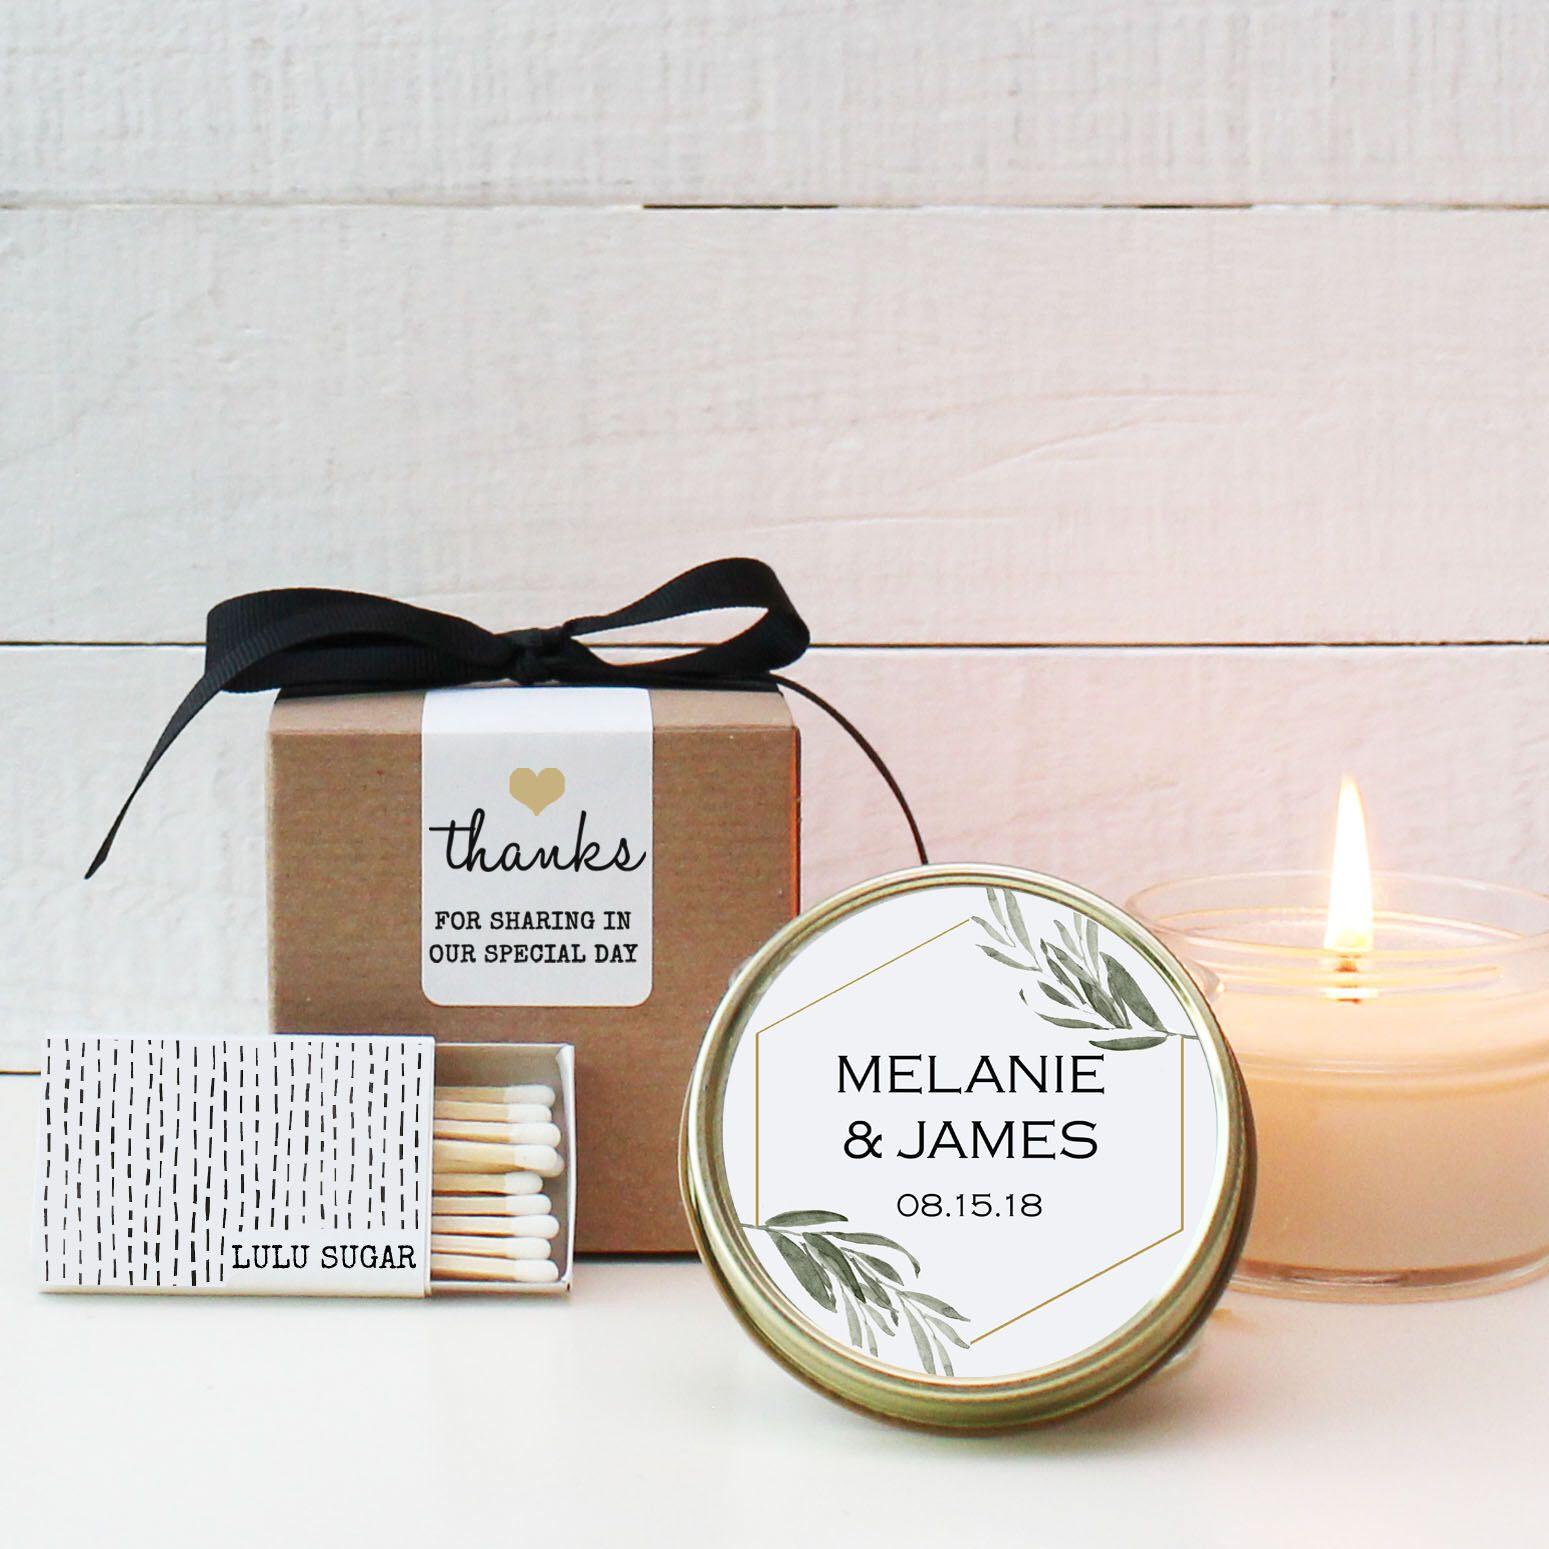 Wedding Favor Candles Minimalist Label Design Personalized Etsy Candle Wedding Favors Personalized Candle Favors Candle Favors